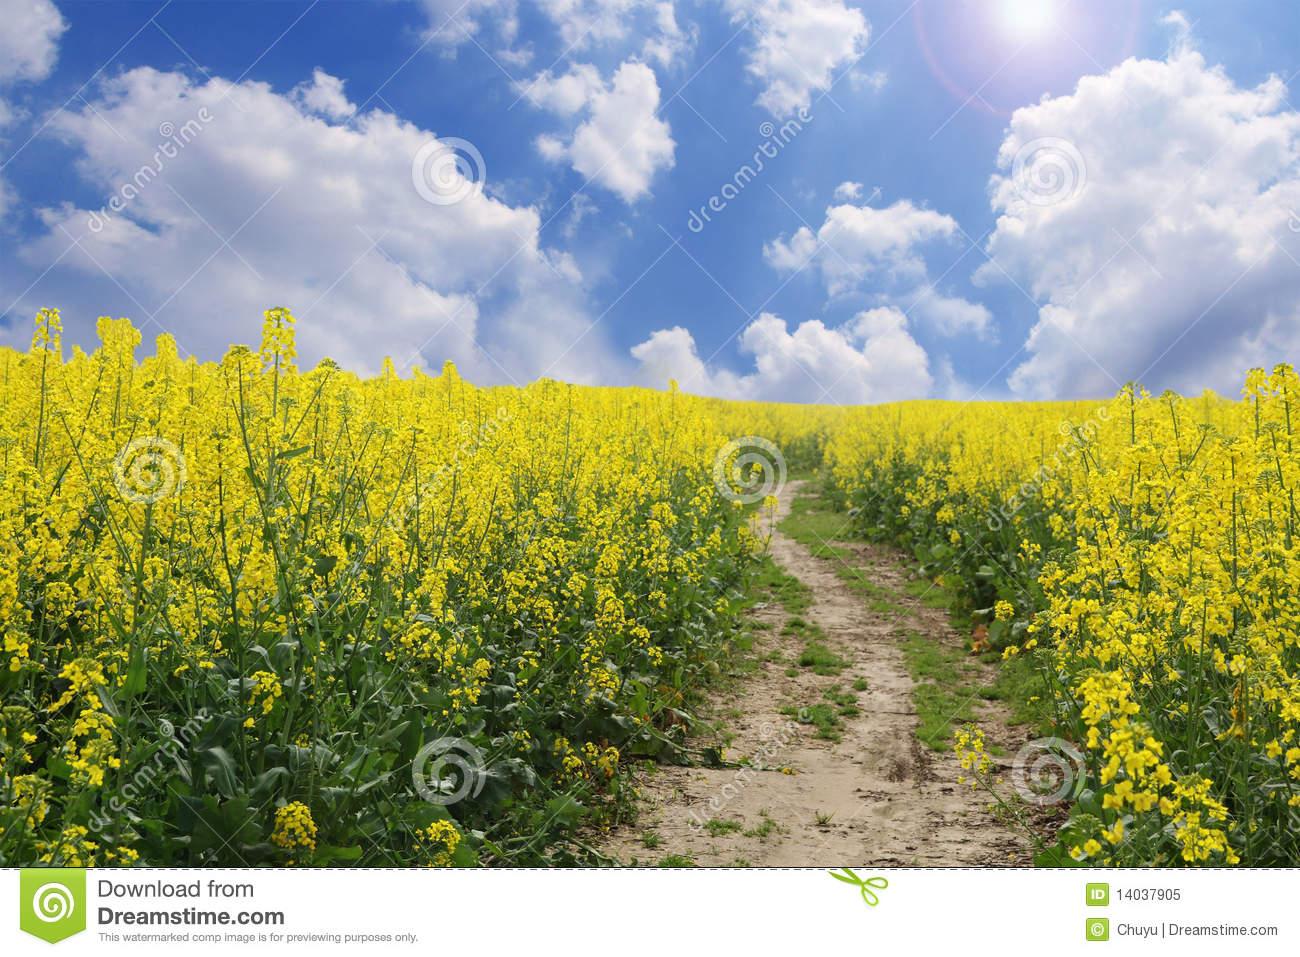 Top Spring Meadow Scenery Wallpaper Wallpapers 1300x957